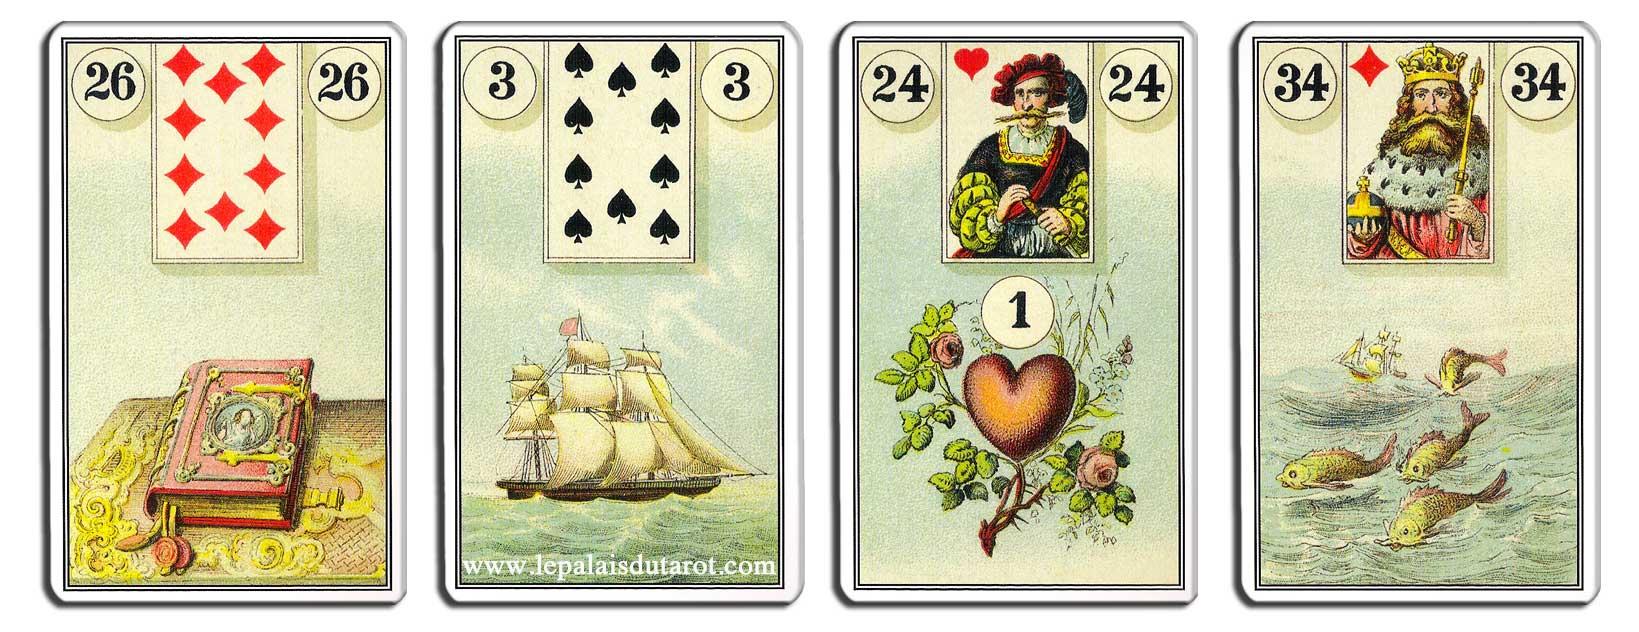 jeu carte lenormand gratuit 0eaac2736d56